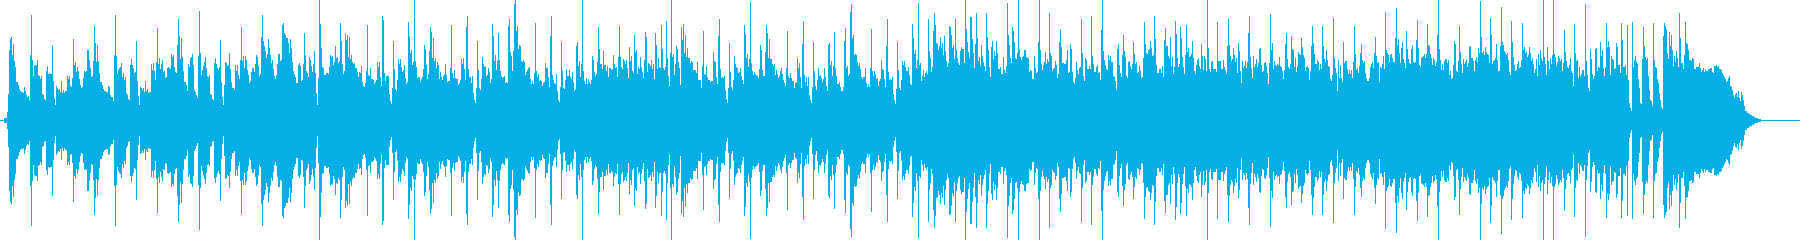 CM、スラップベースでの高揚感ある楽曲の再生済みの波形